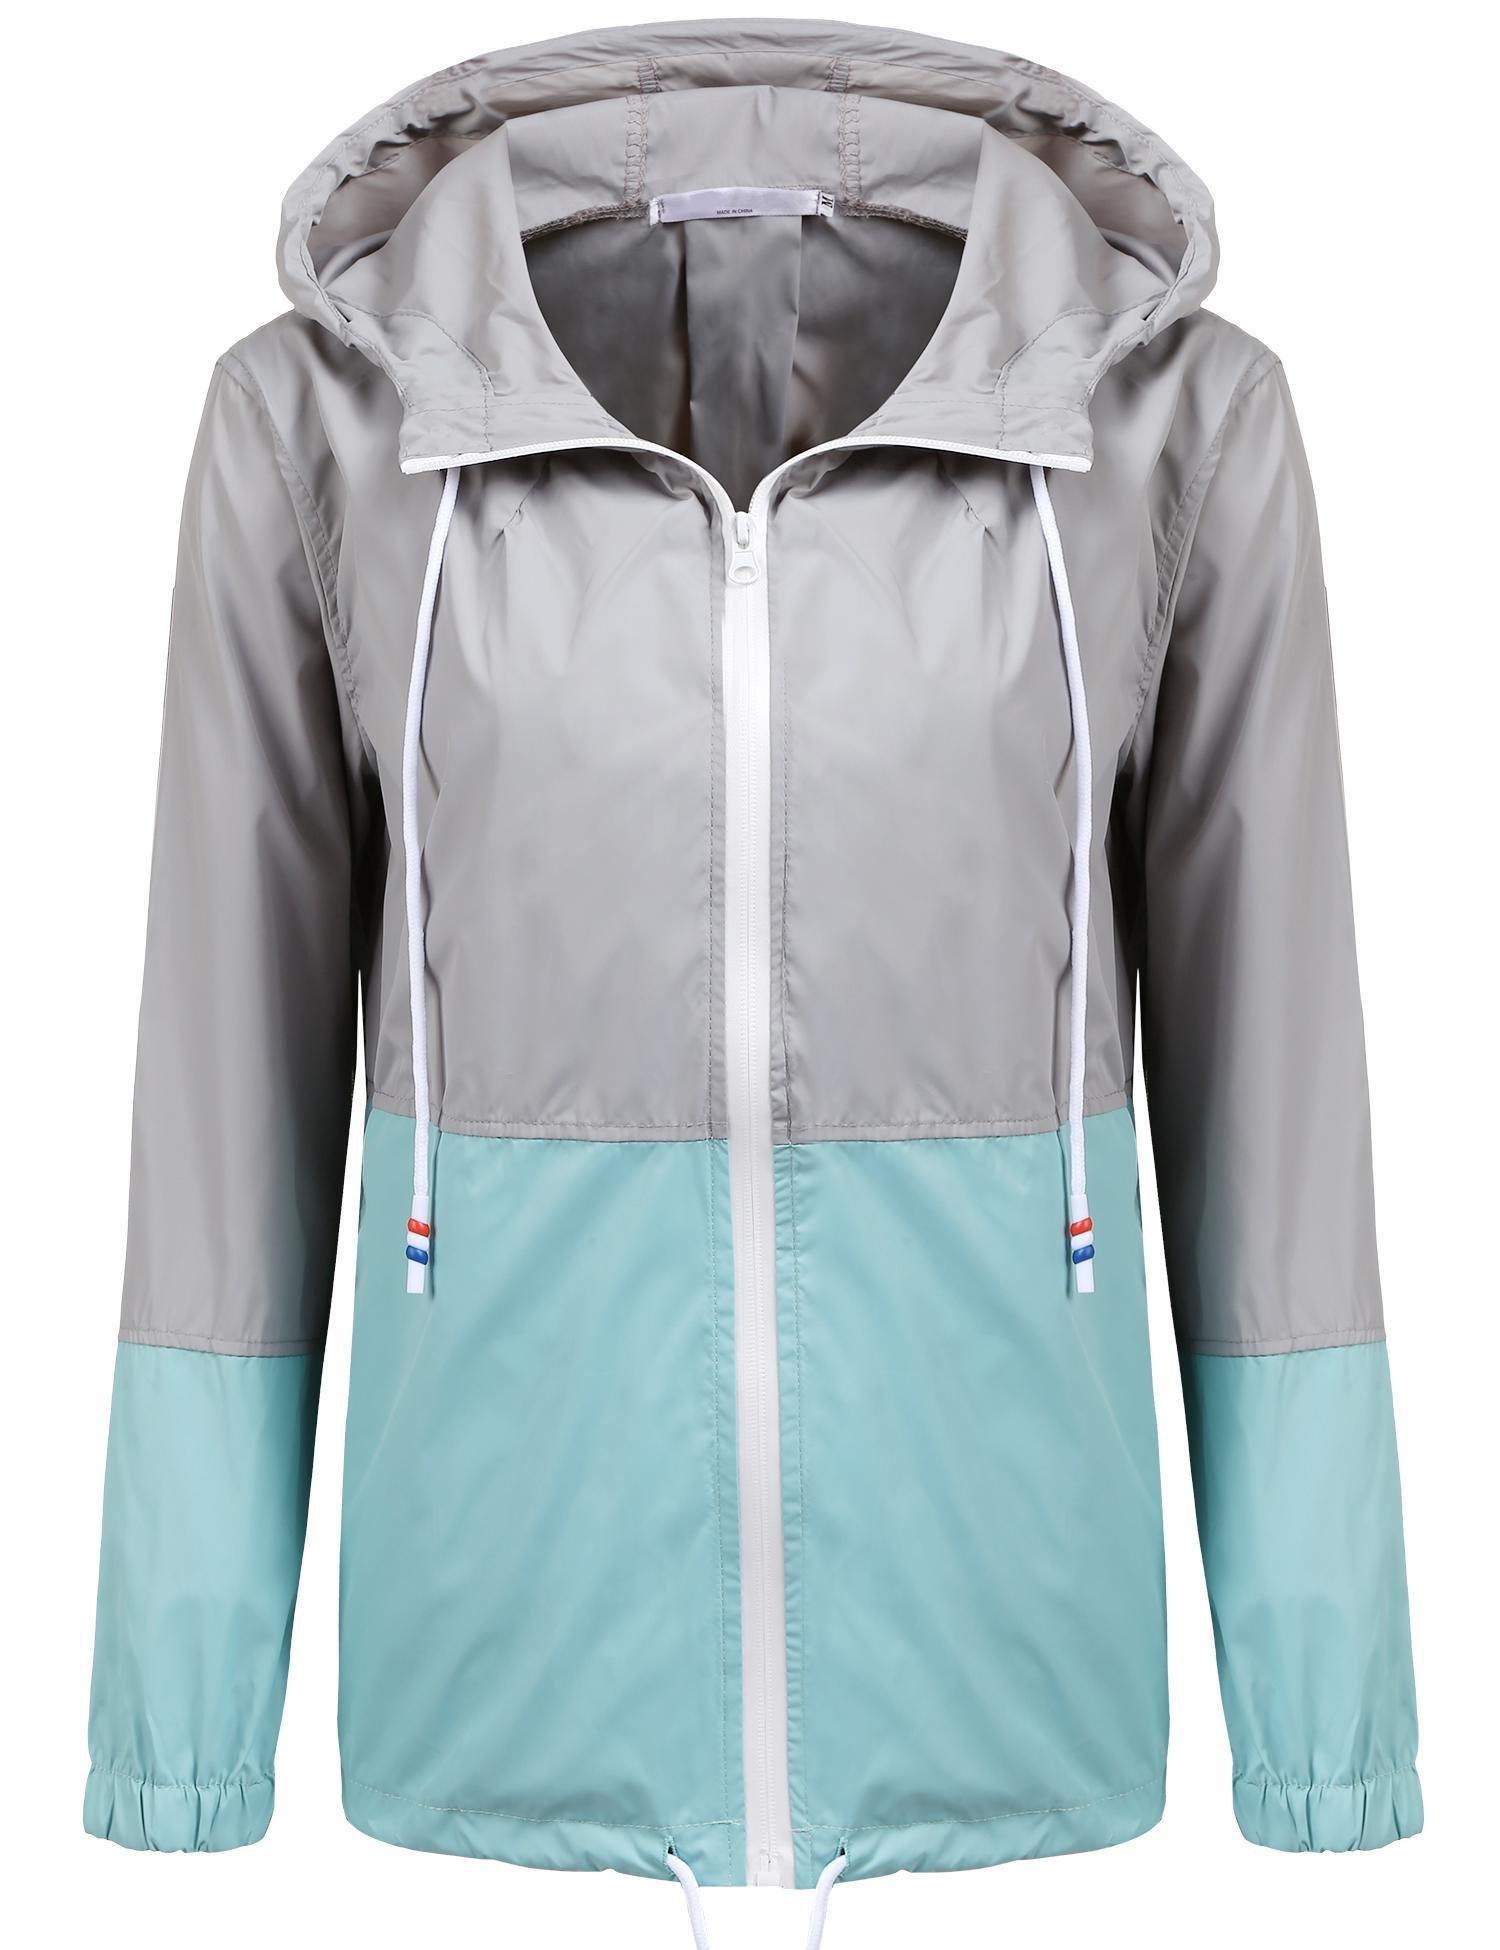 SoTeer Women's Waterproof Raincoat Outdoor Hooded Rain Jacket Windbreaker (Lake Blue M)